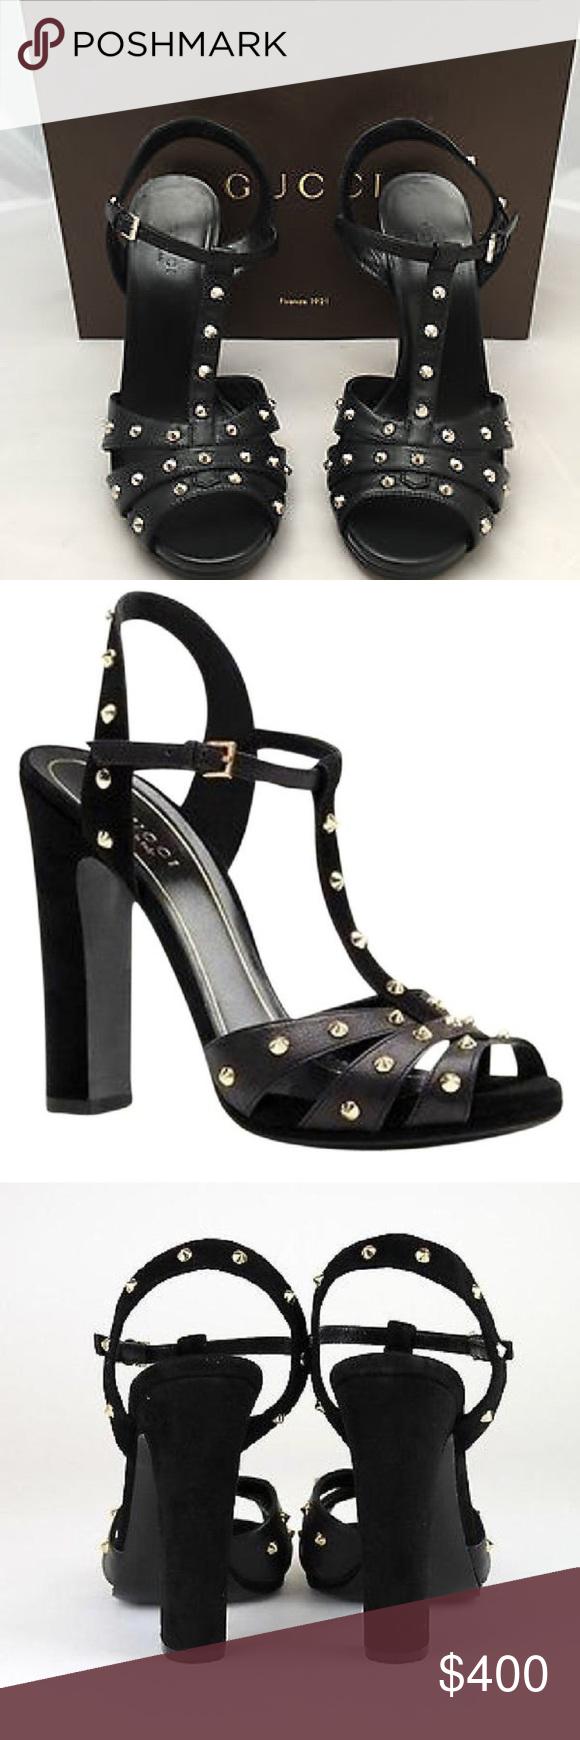 f8083ba8d77 Gucci Jacquelyn Studded Sandals Authentic Gucci